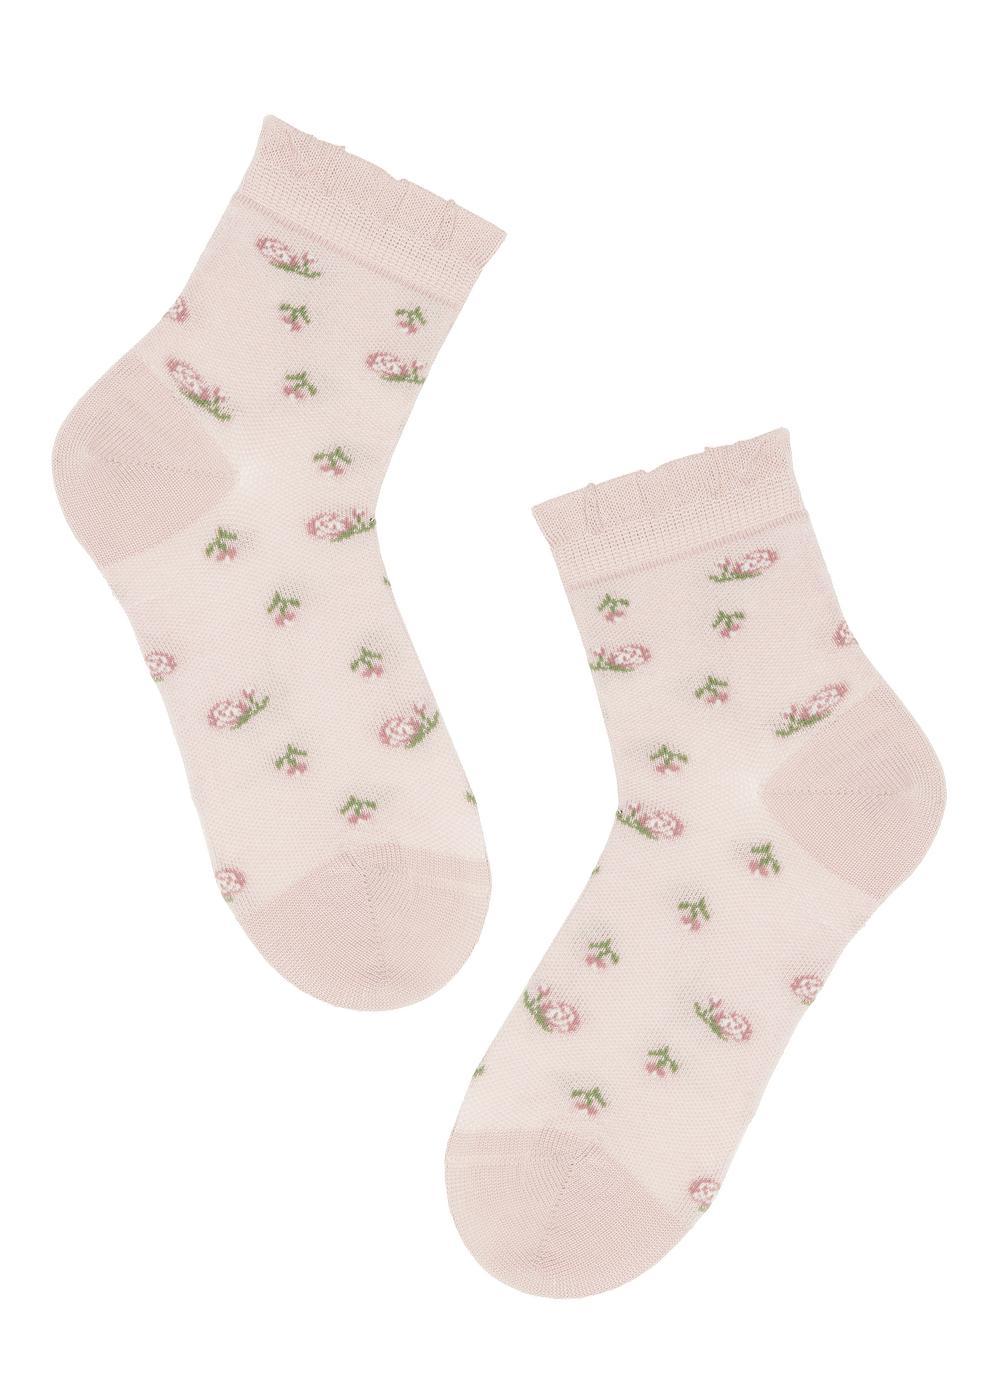 Kids' patterned cotton ankle socks